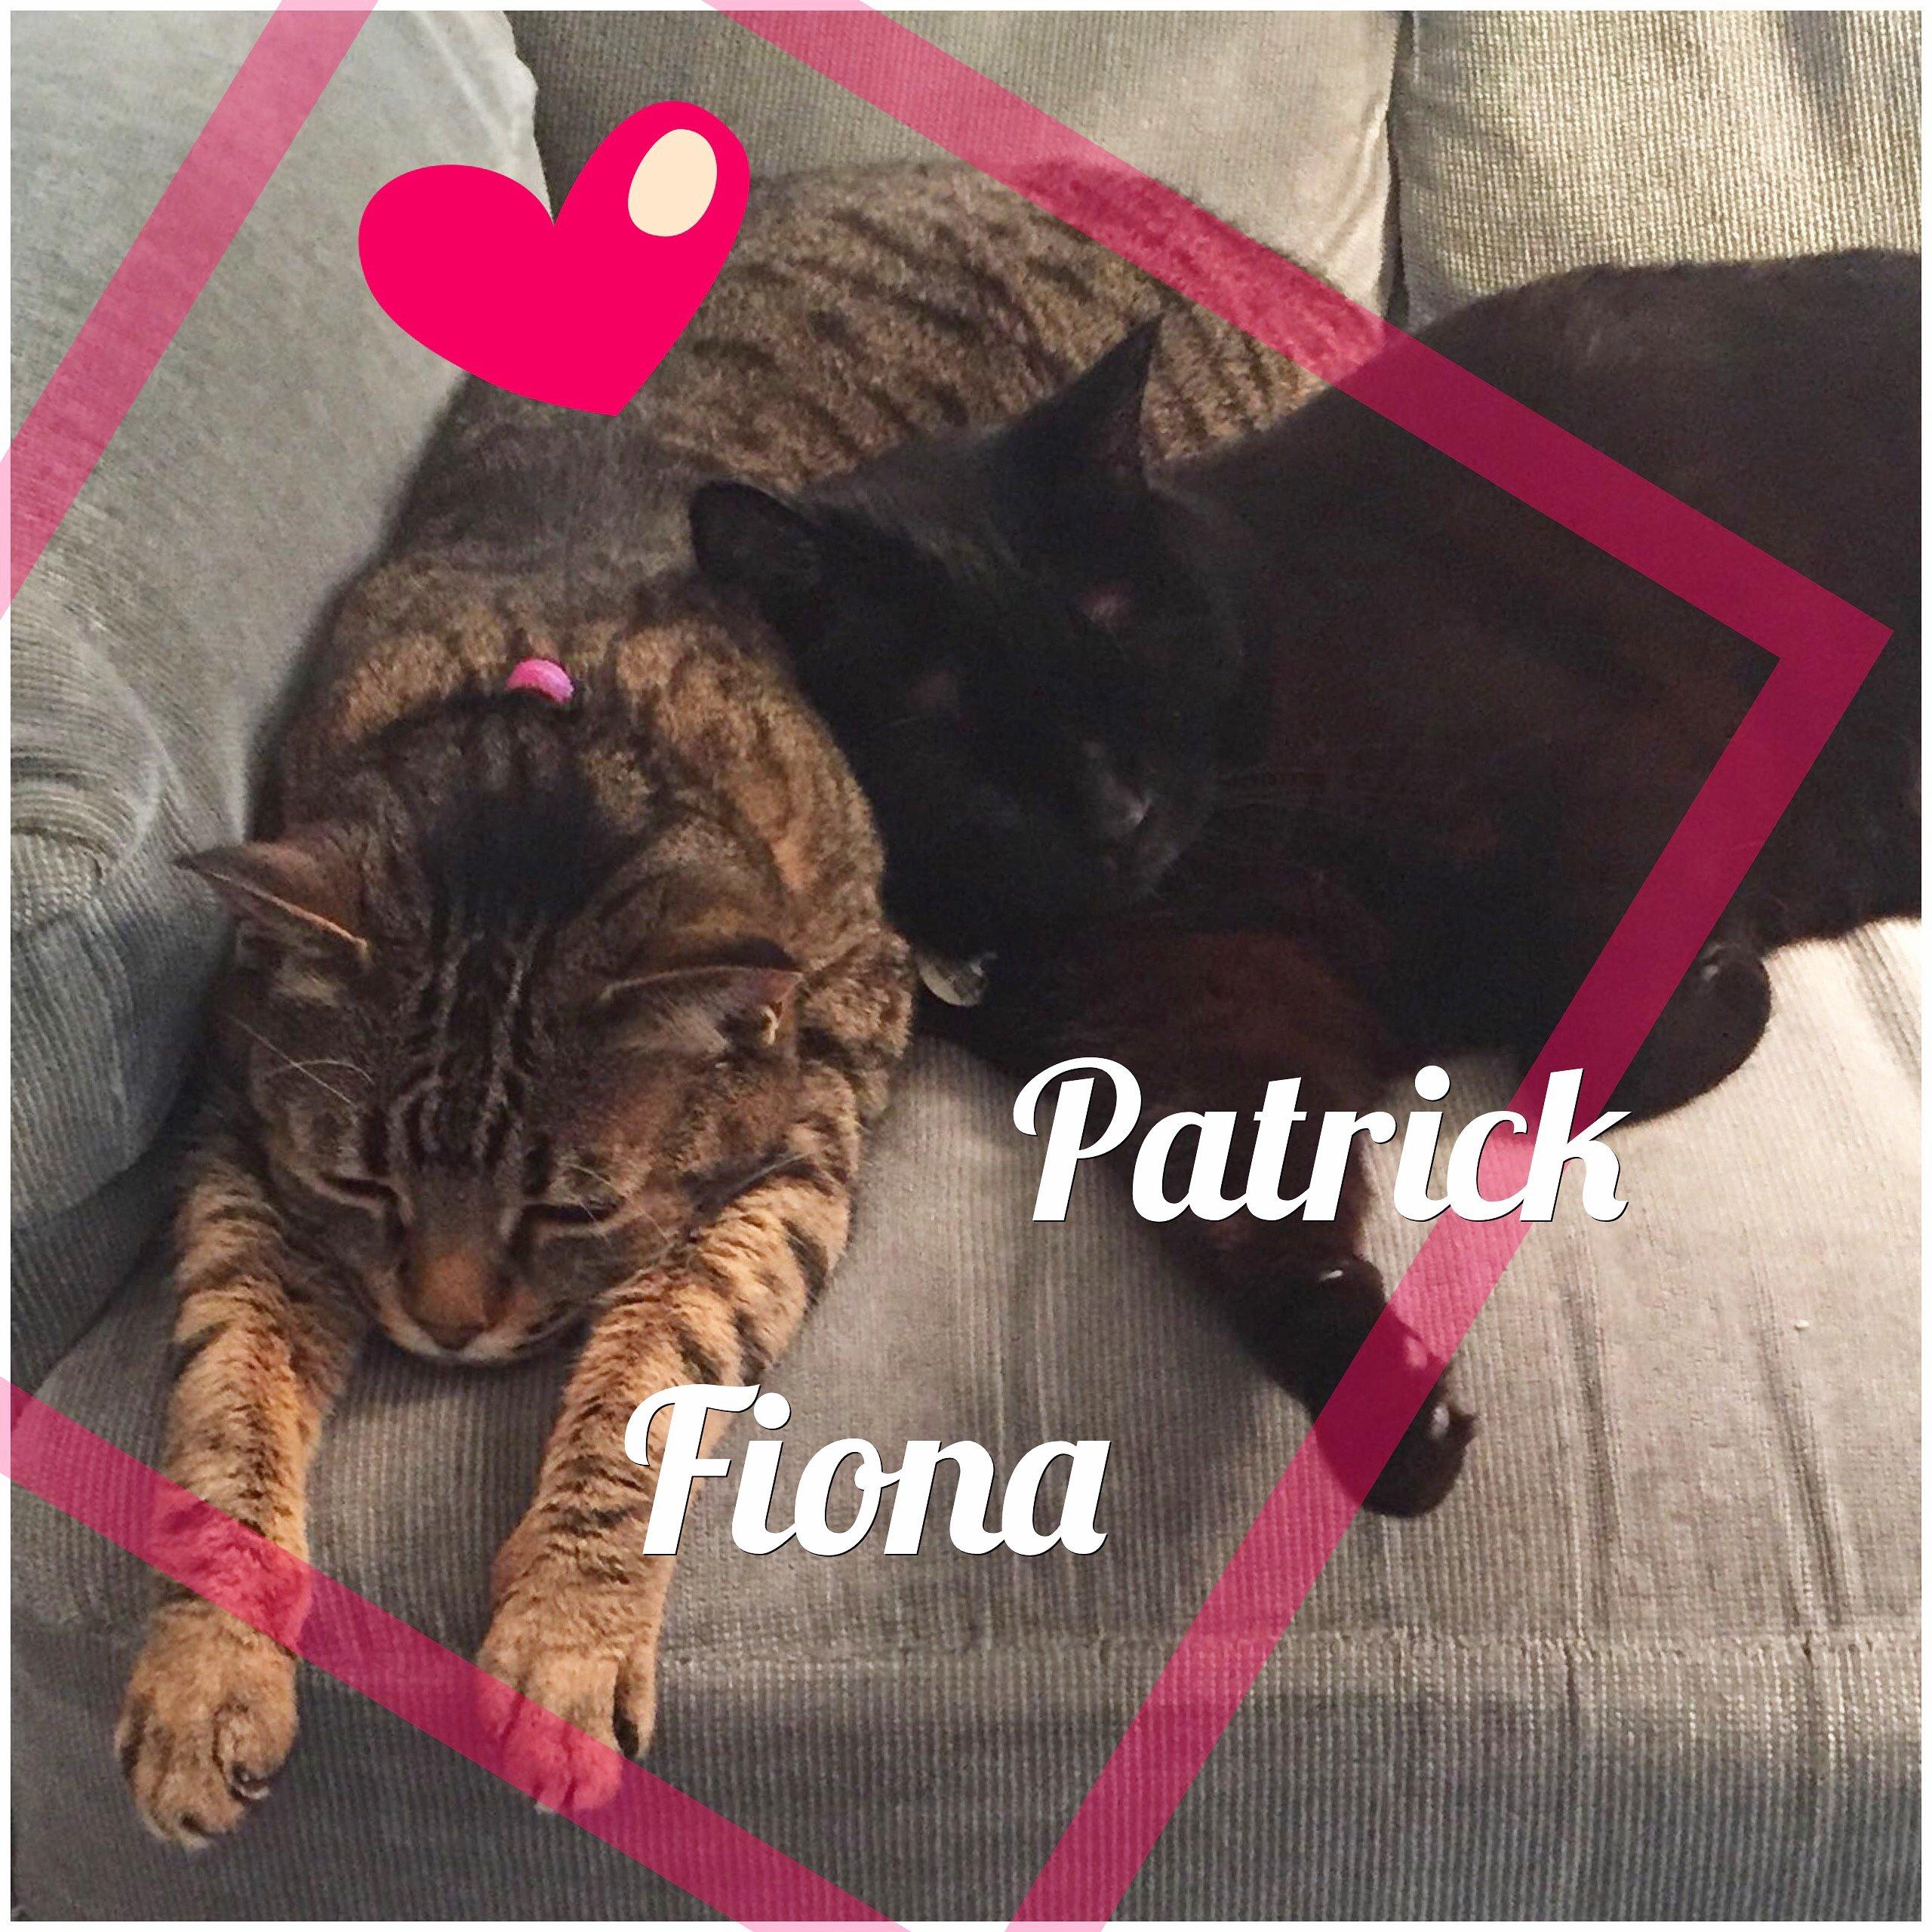 Patrick and Fiona